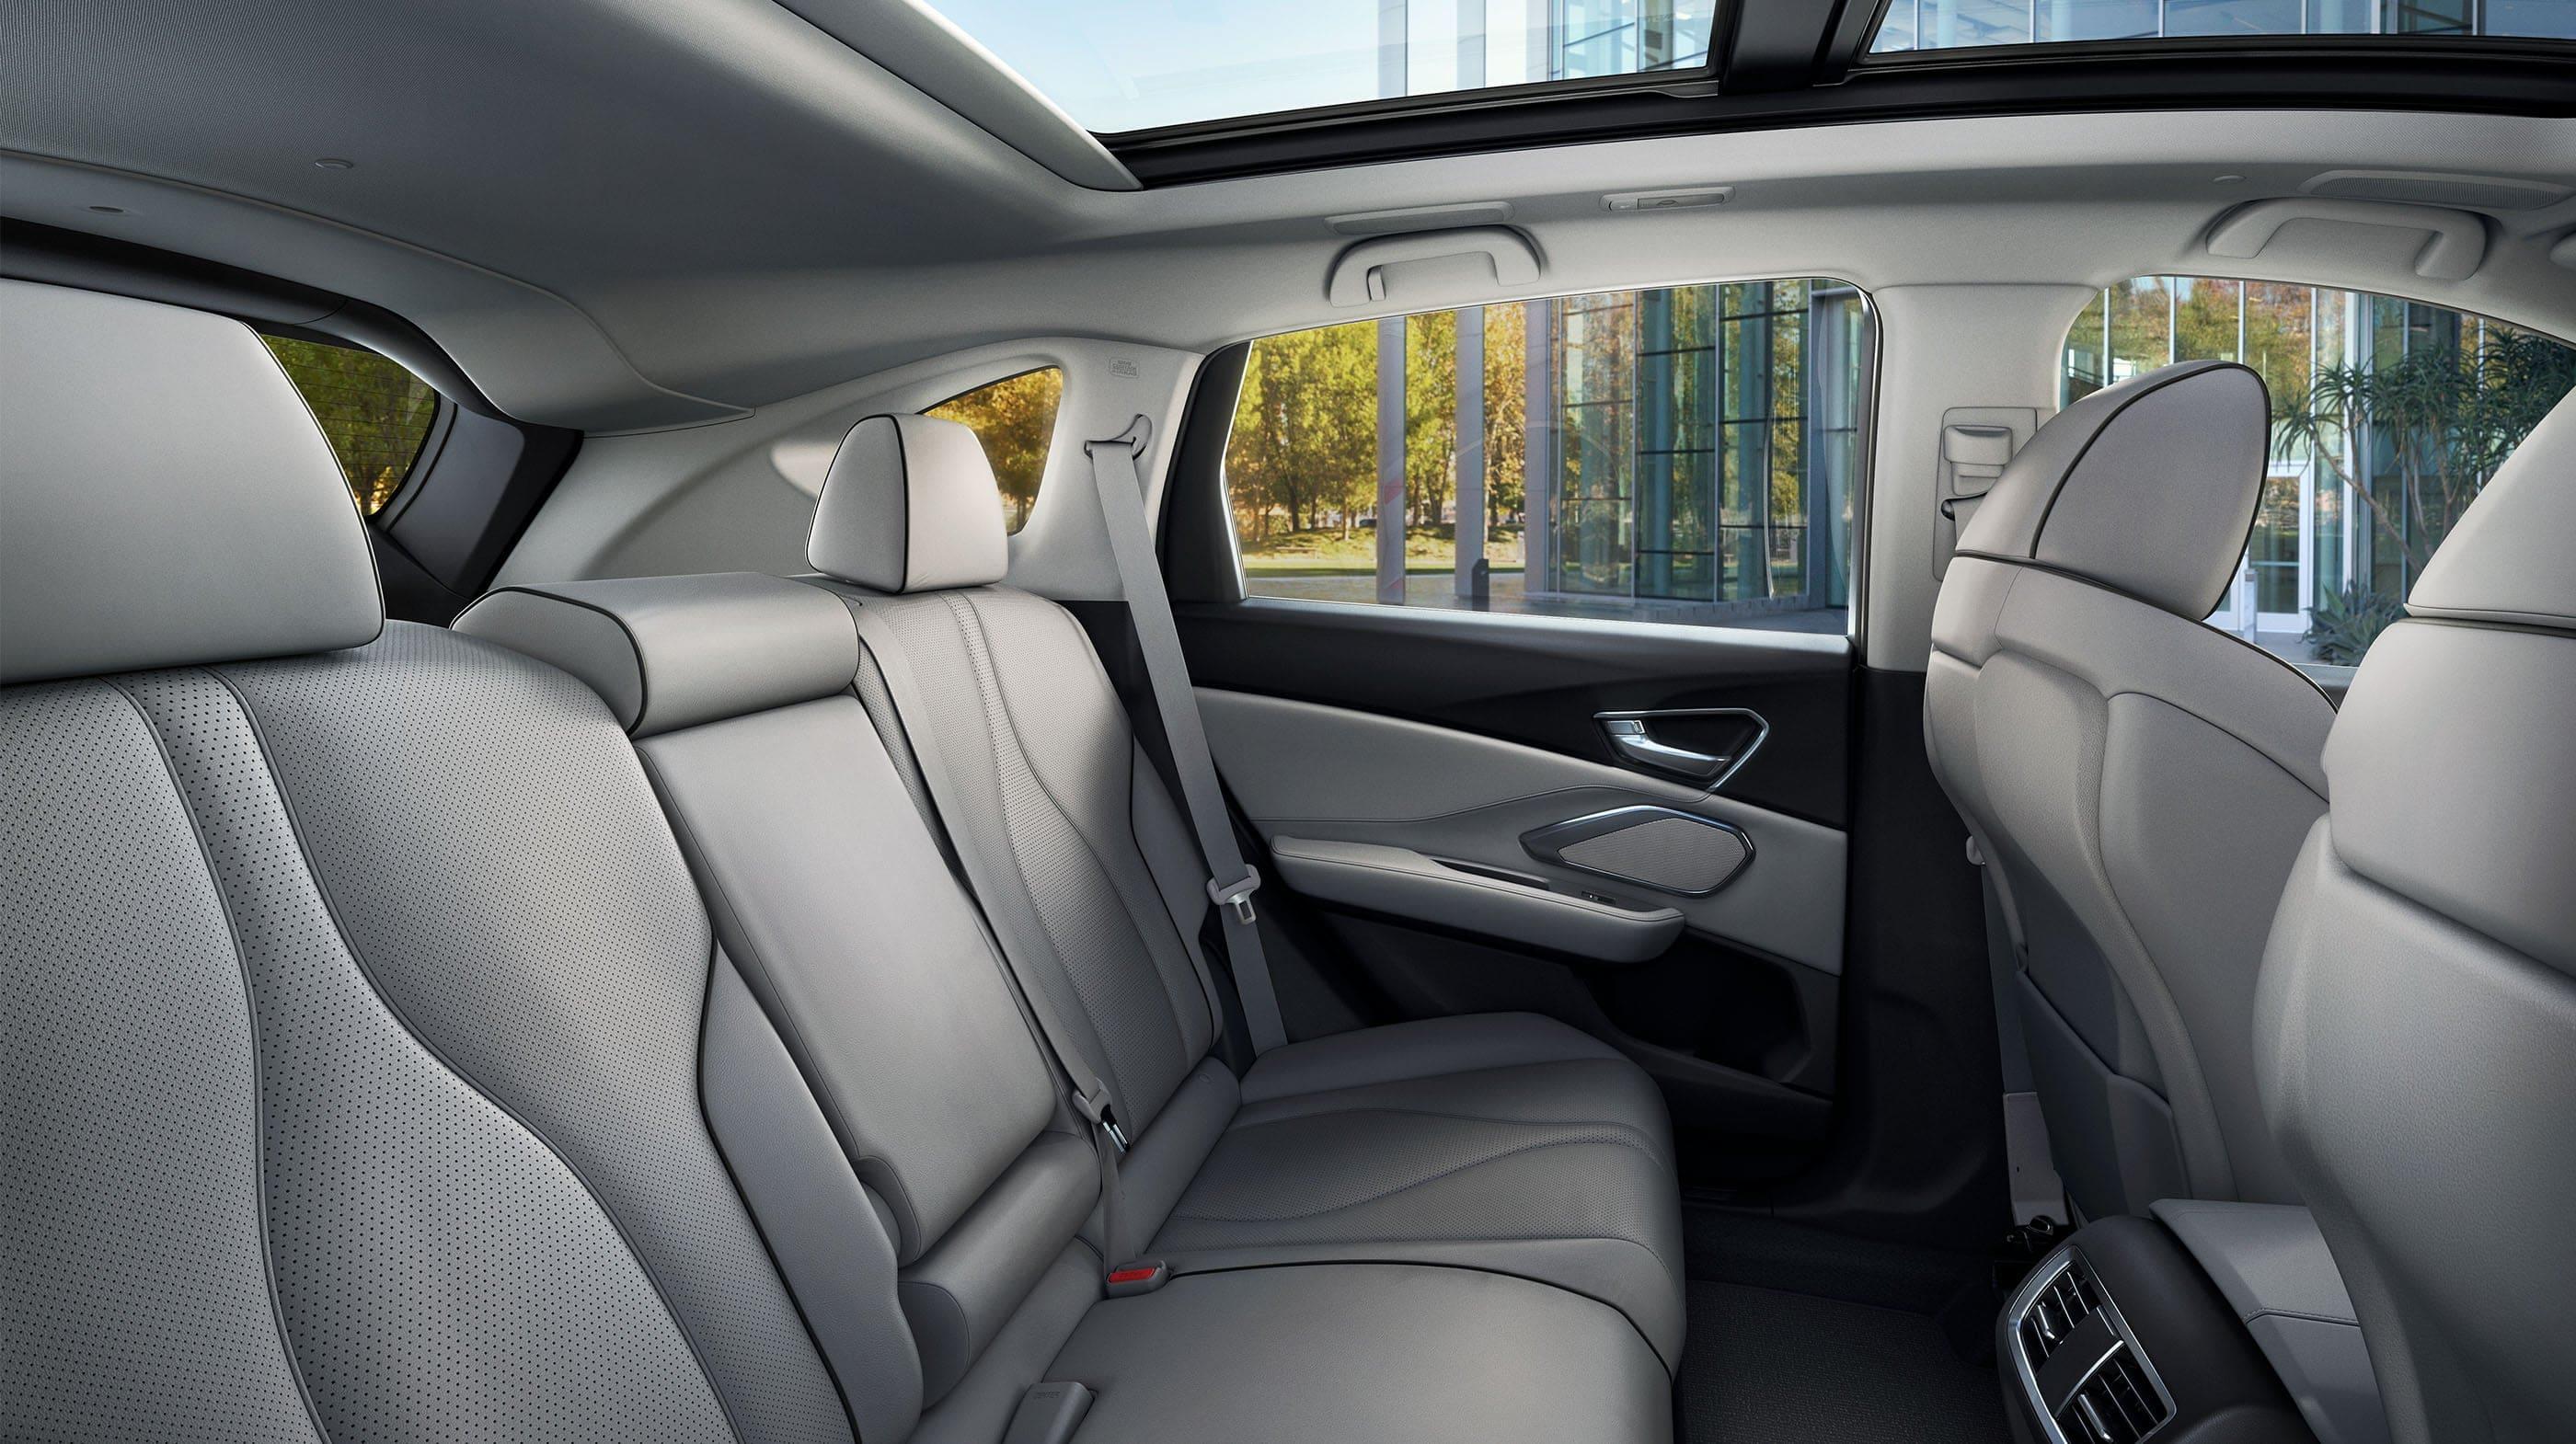 2020 Acura Mdx Redesign Release Date Price